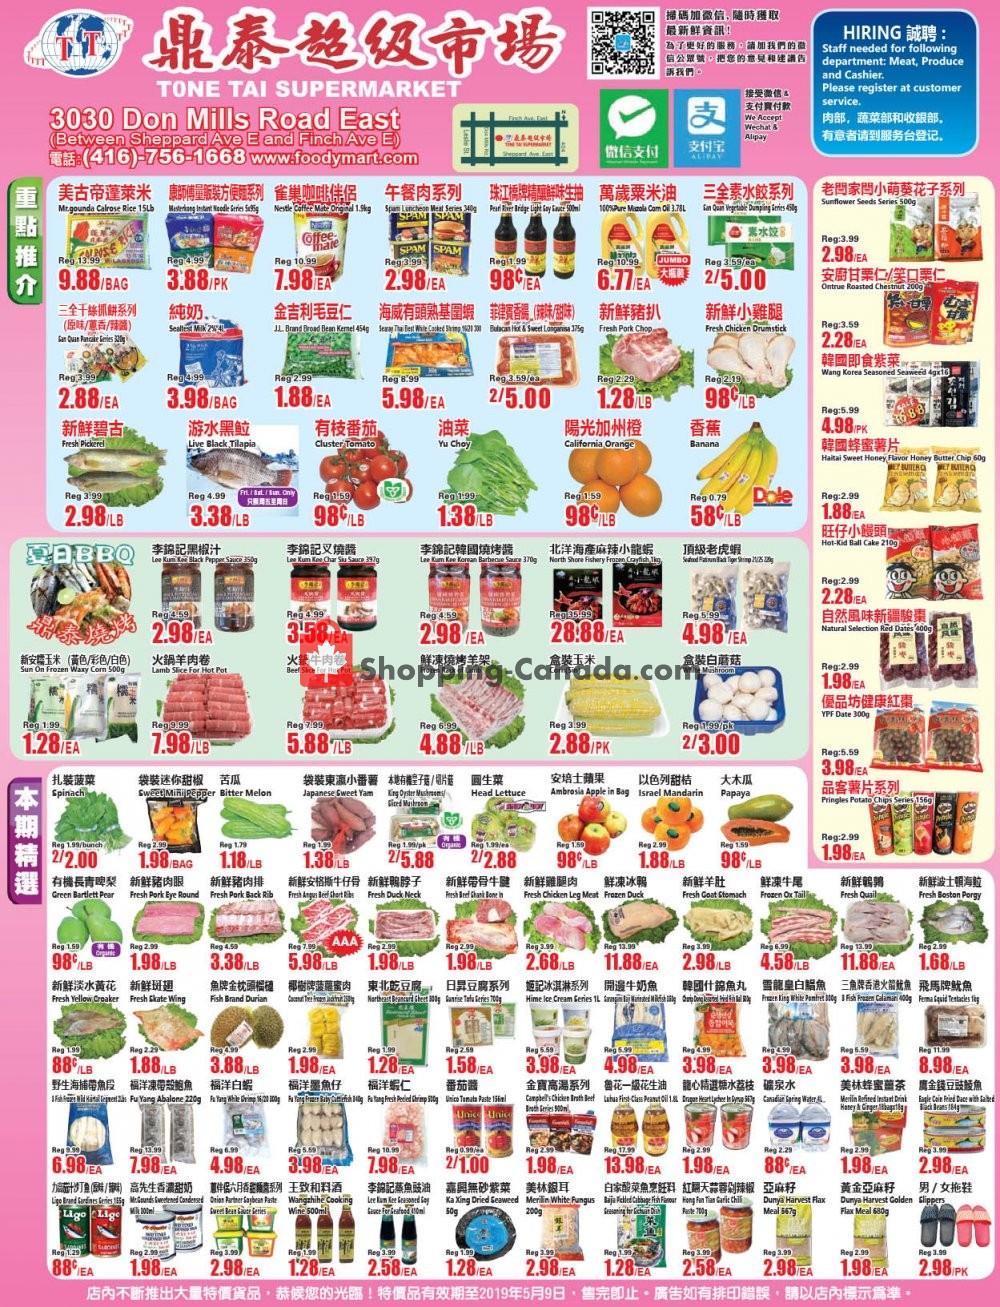 Flyer Tone Tai Supermarket Canada - from Friday May 3, 2019 to Thursday May 9, 2019